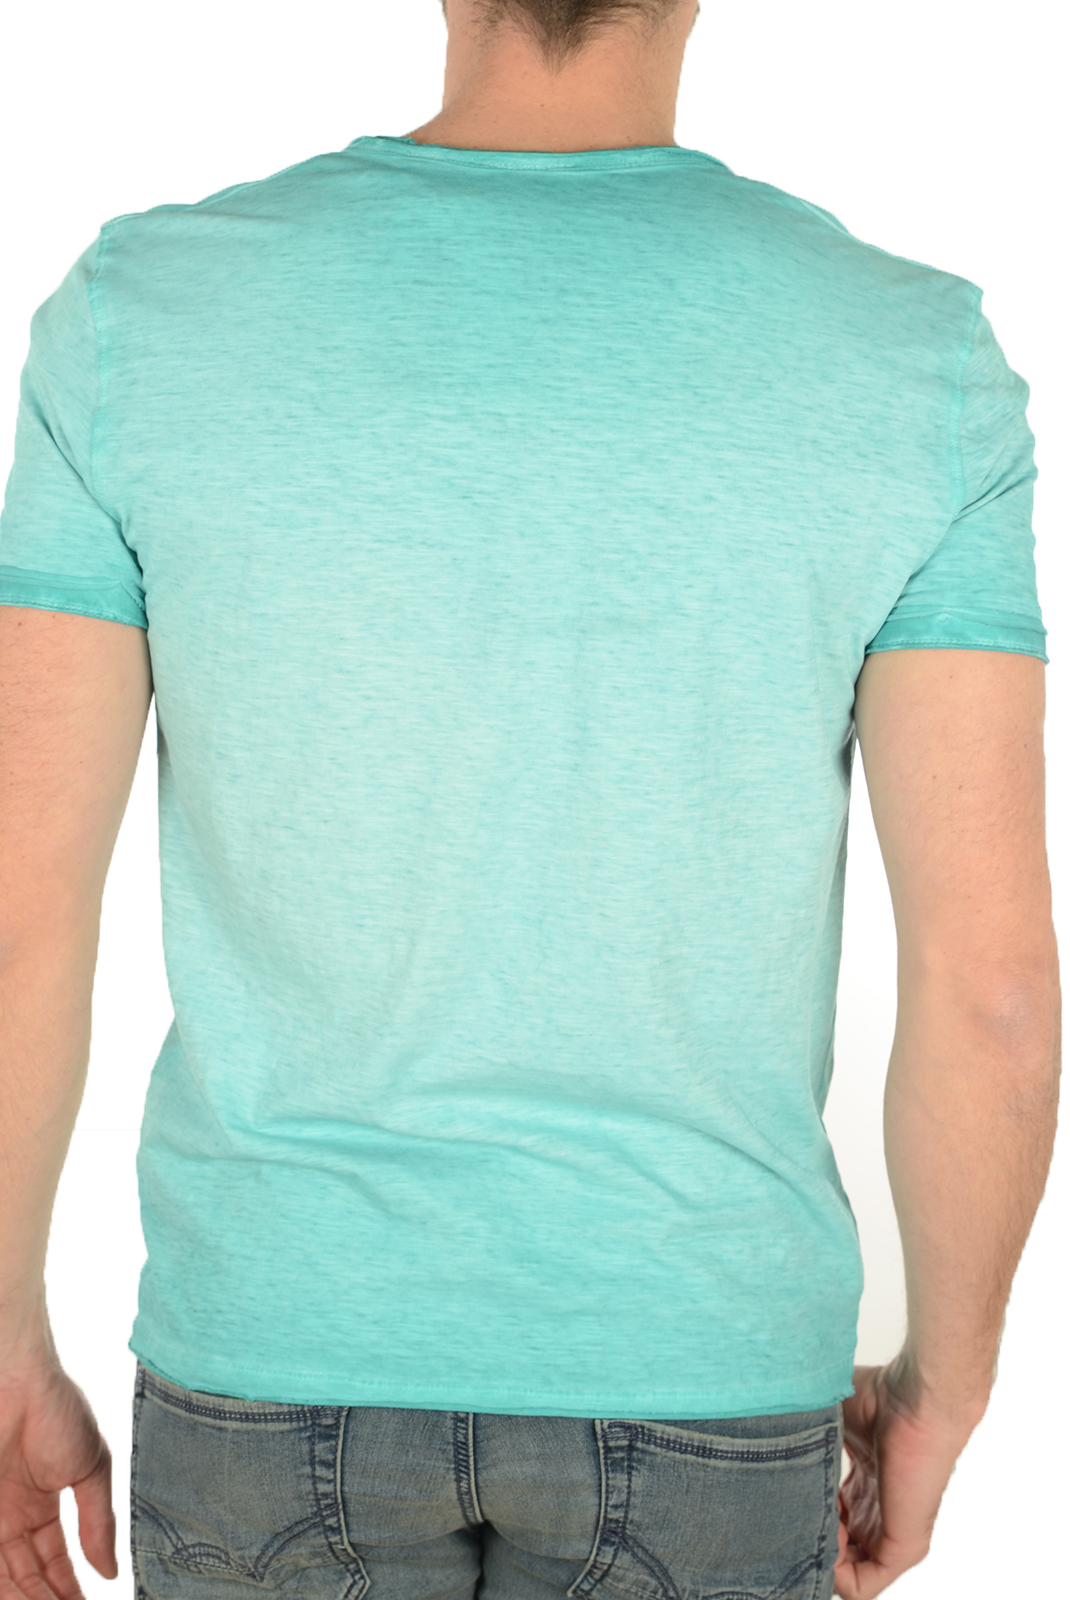 Tee-shirts  Kaporal TOKOA AQUA SKY